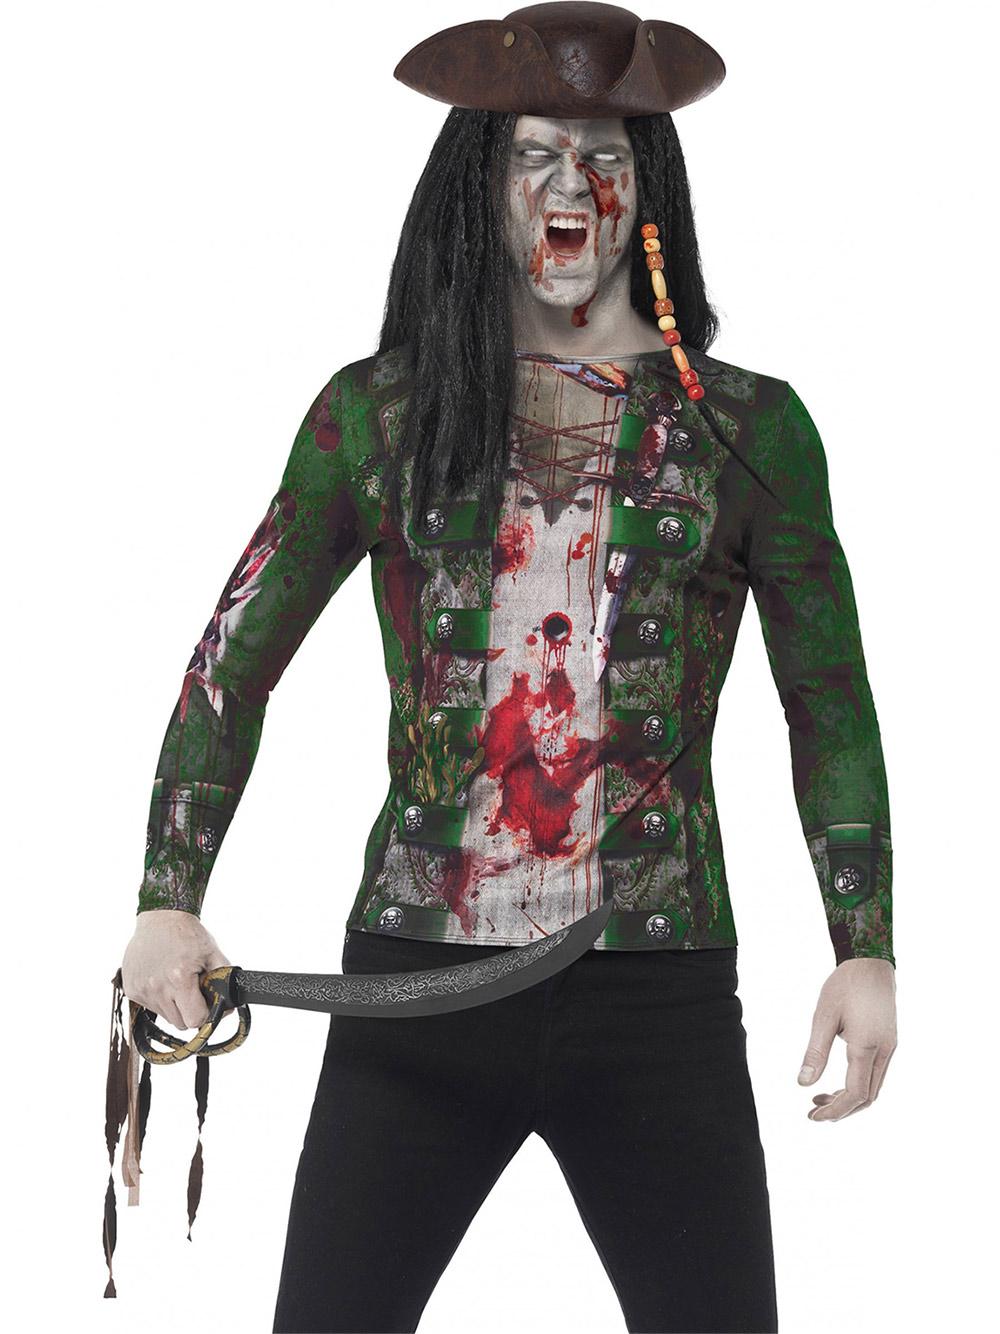 Disfraz De Pirata Zombie Hombre Adulto Disfraces Adultosy - Maquillaje-zombie-hombre